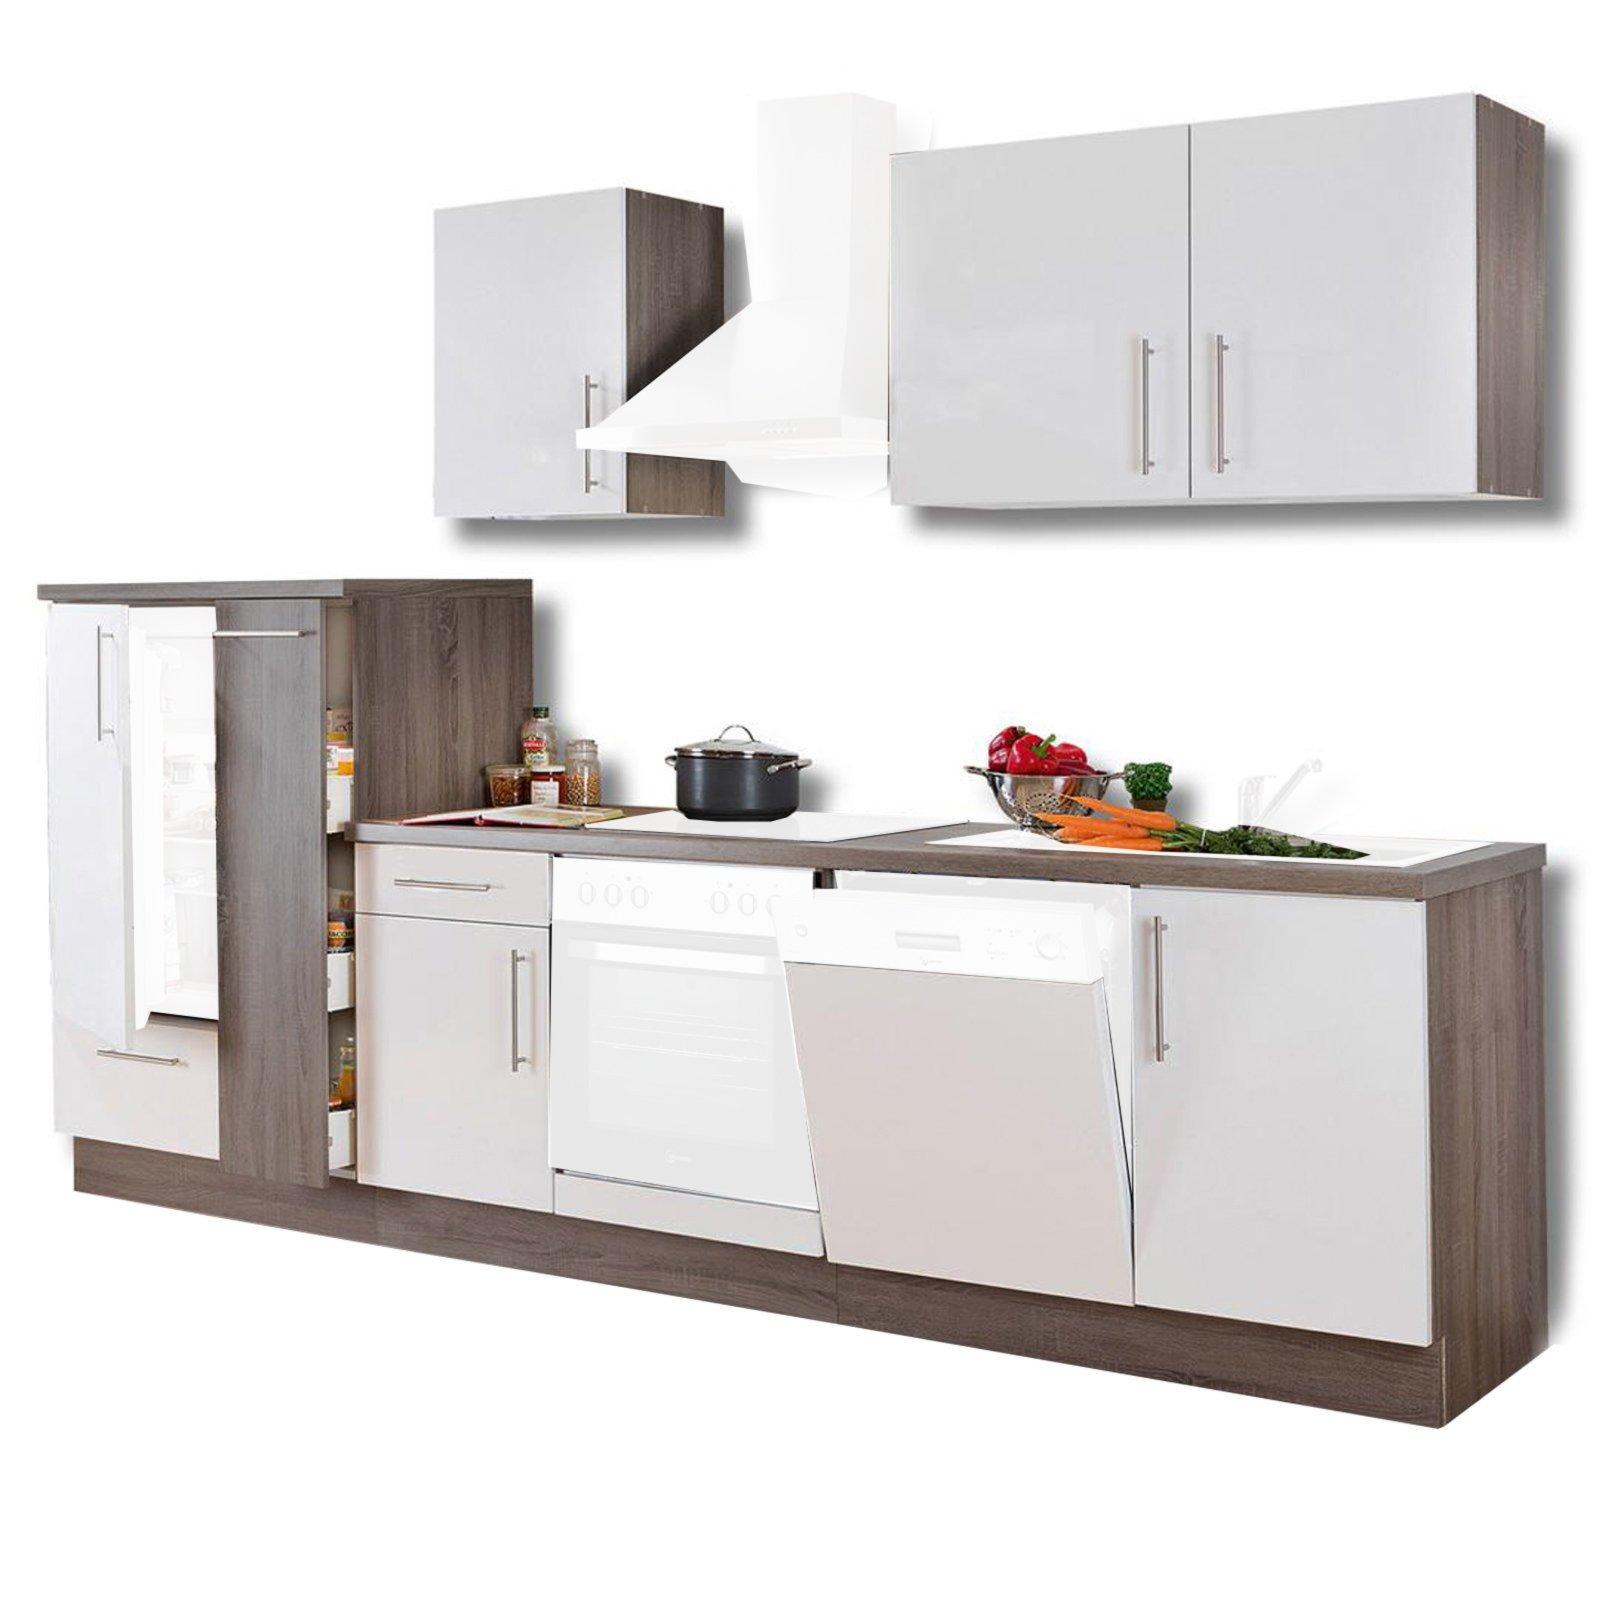 k chenblock julia wei hochglanz tr ffel 310 cm ebay. Black Bedroom Furniture Sets. Home Design Ideas